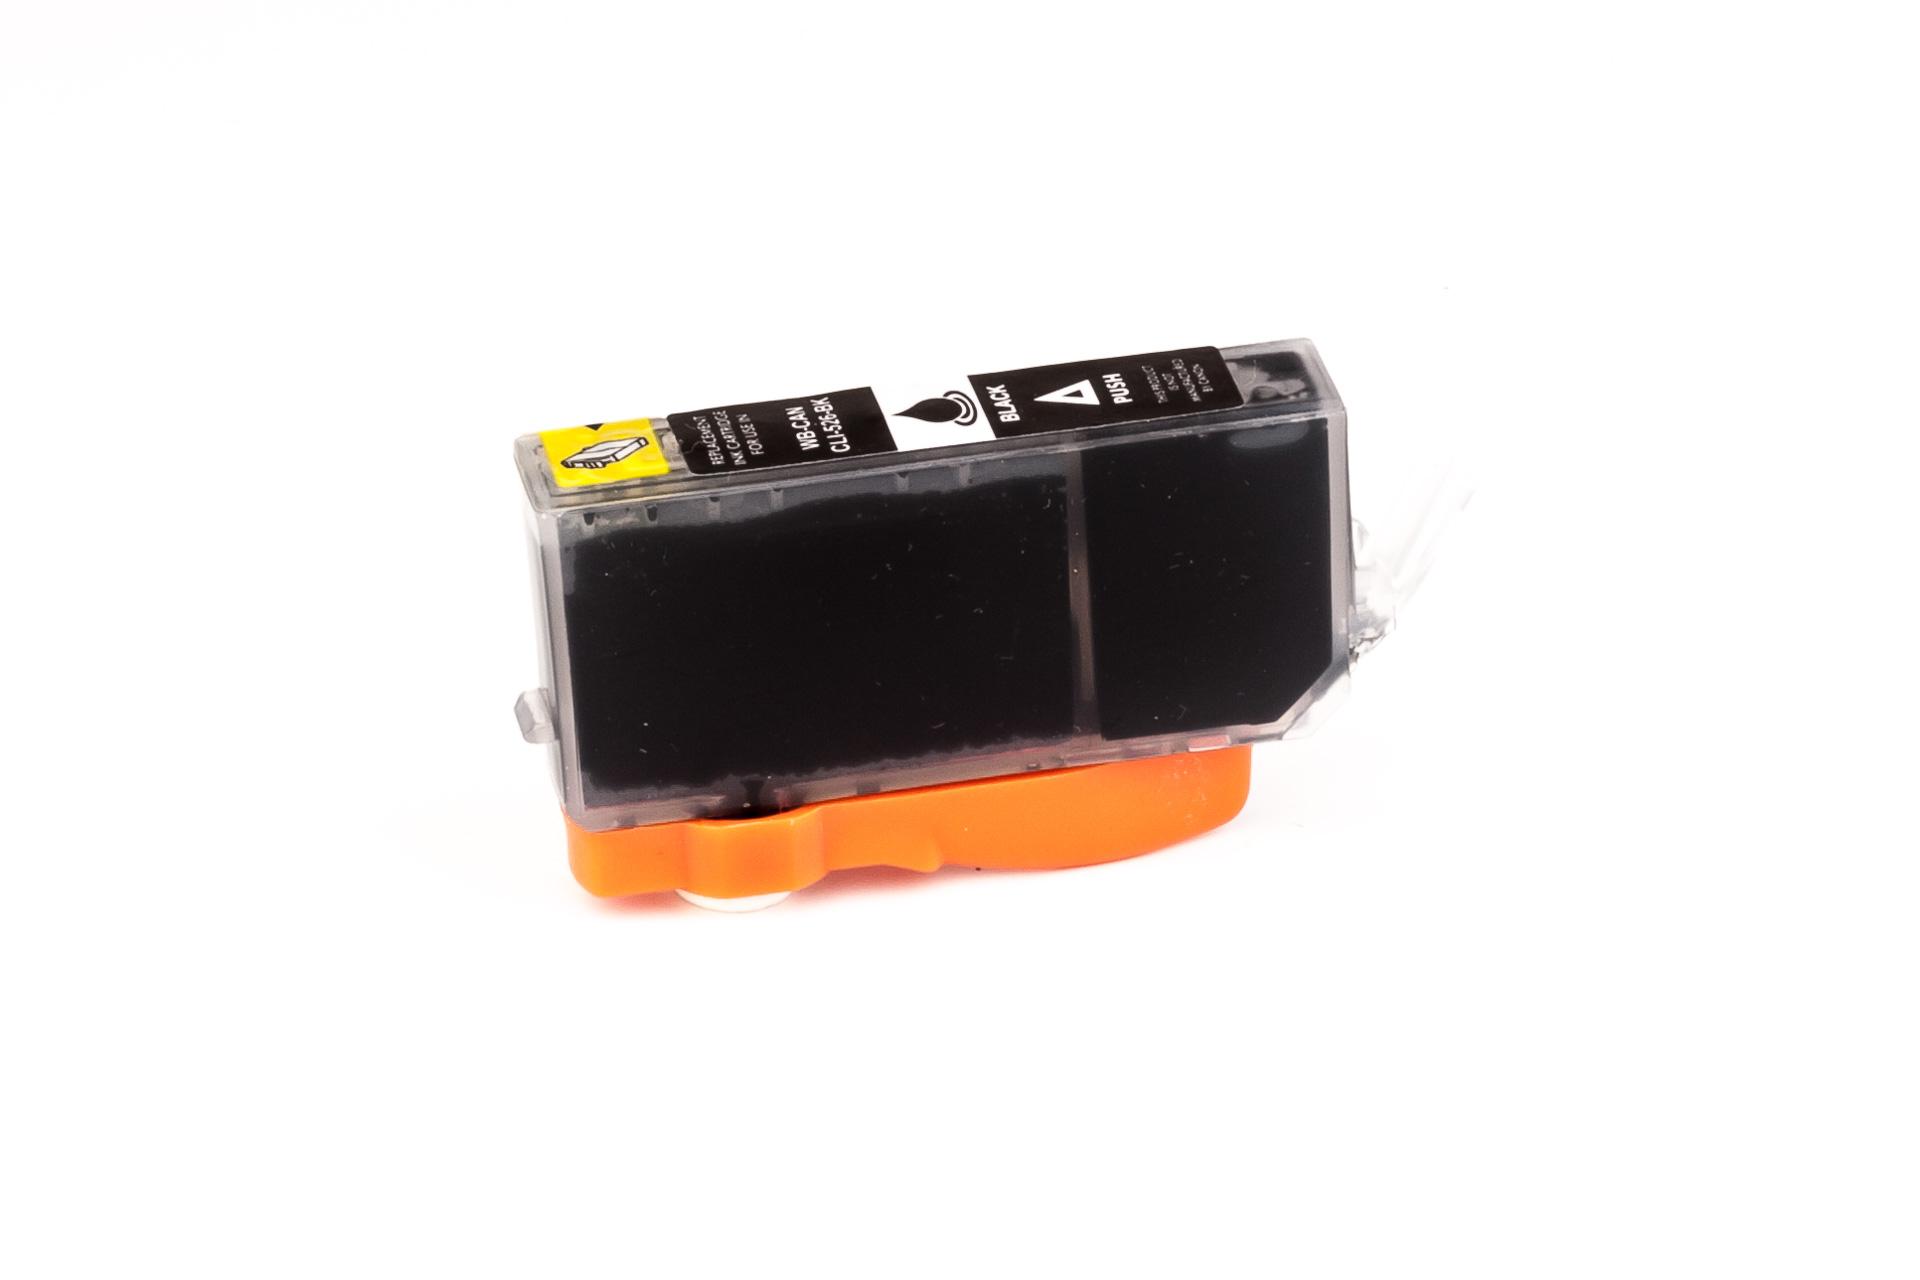 ASC-Premium-Tintenpatrone für Canon Pixma MG 5350 schwarz Pixma MG 5350 PixmaMG5350